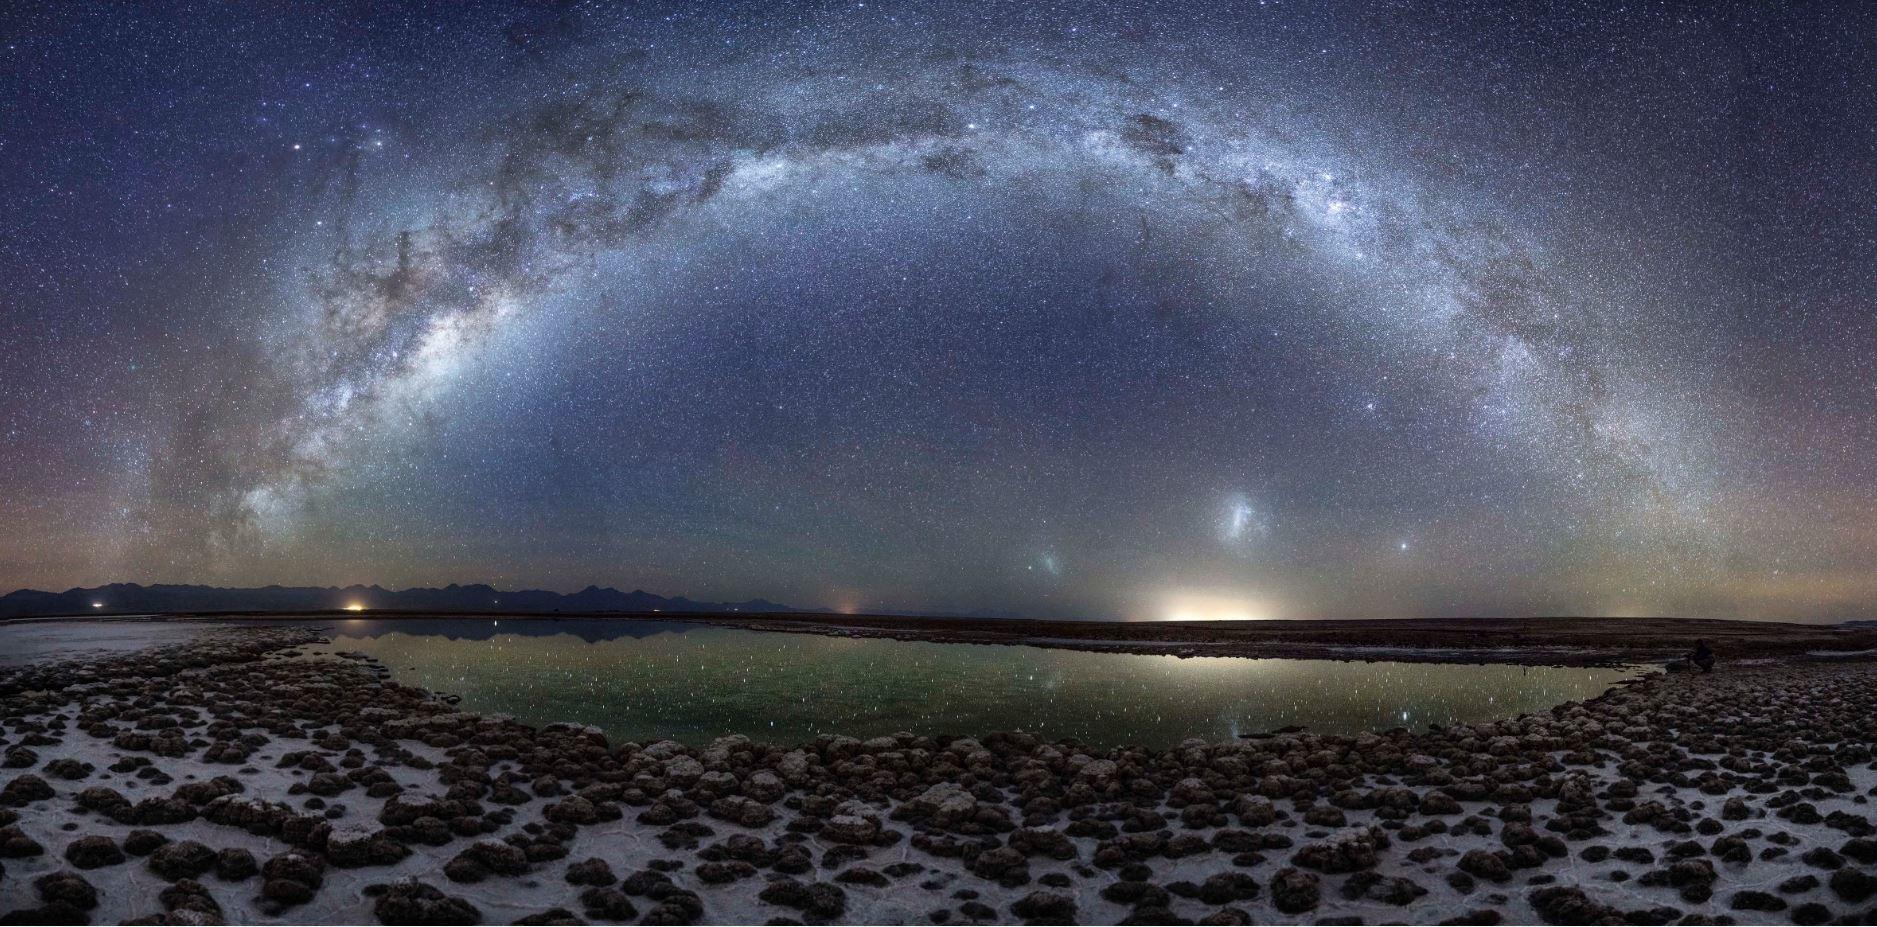 Night sky over the Atacama Salt Flat, Chile. Photo by Dr Leon Gurevitch